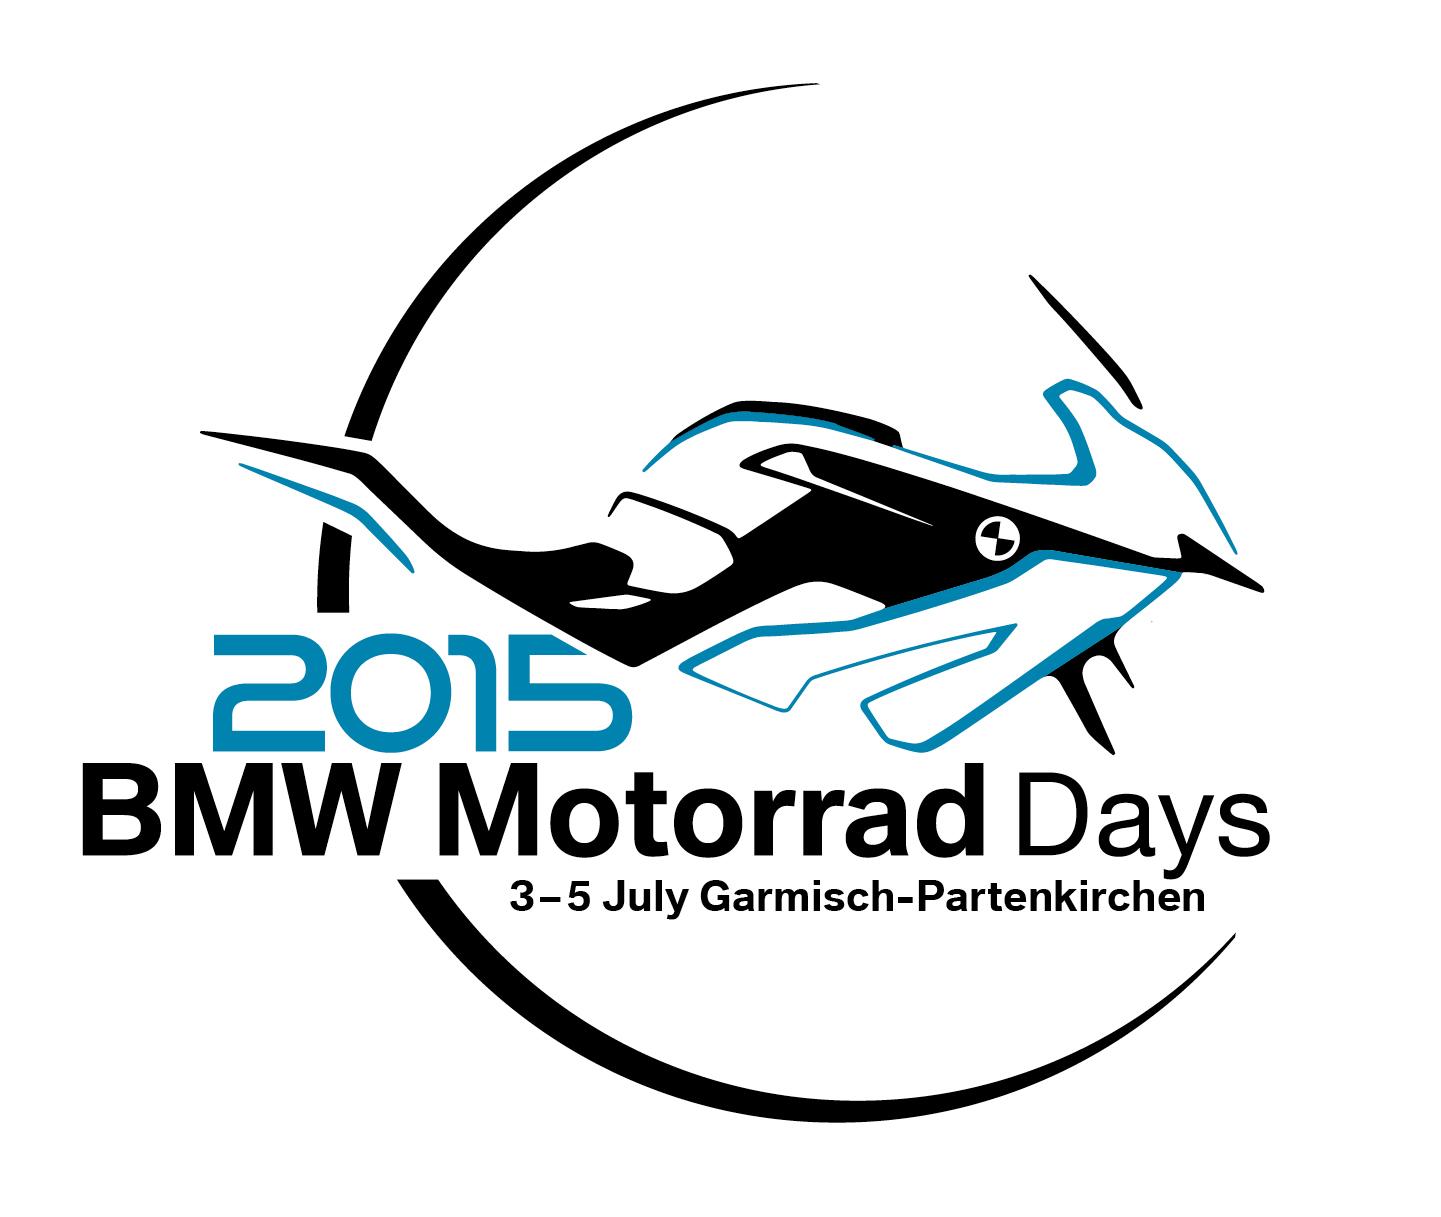 bmw motorrad days 2015 visit us!   bmw motorcycle accessory hornig